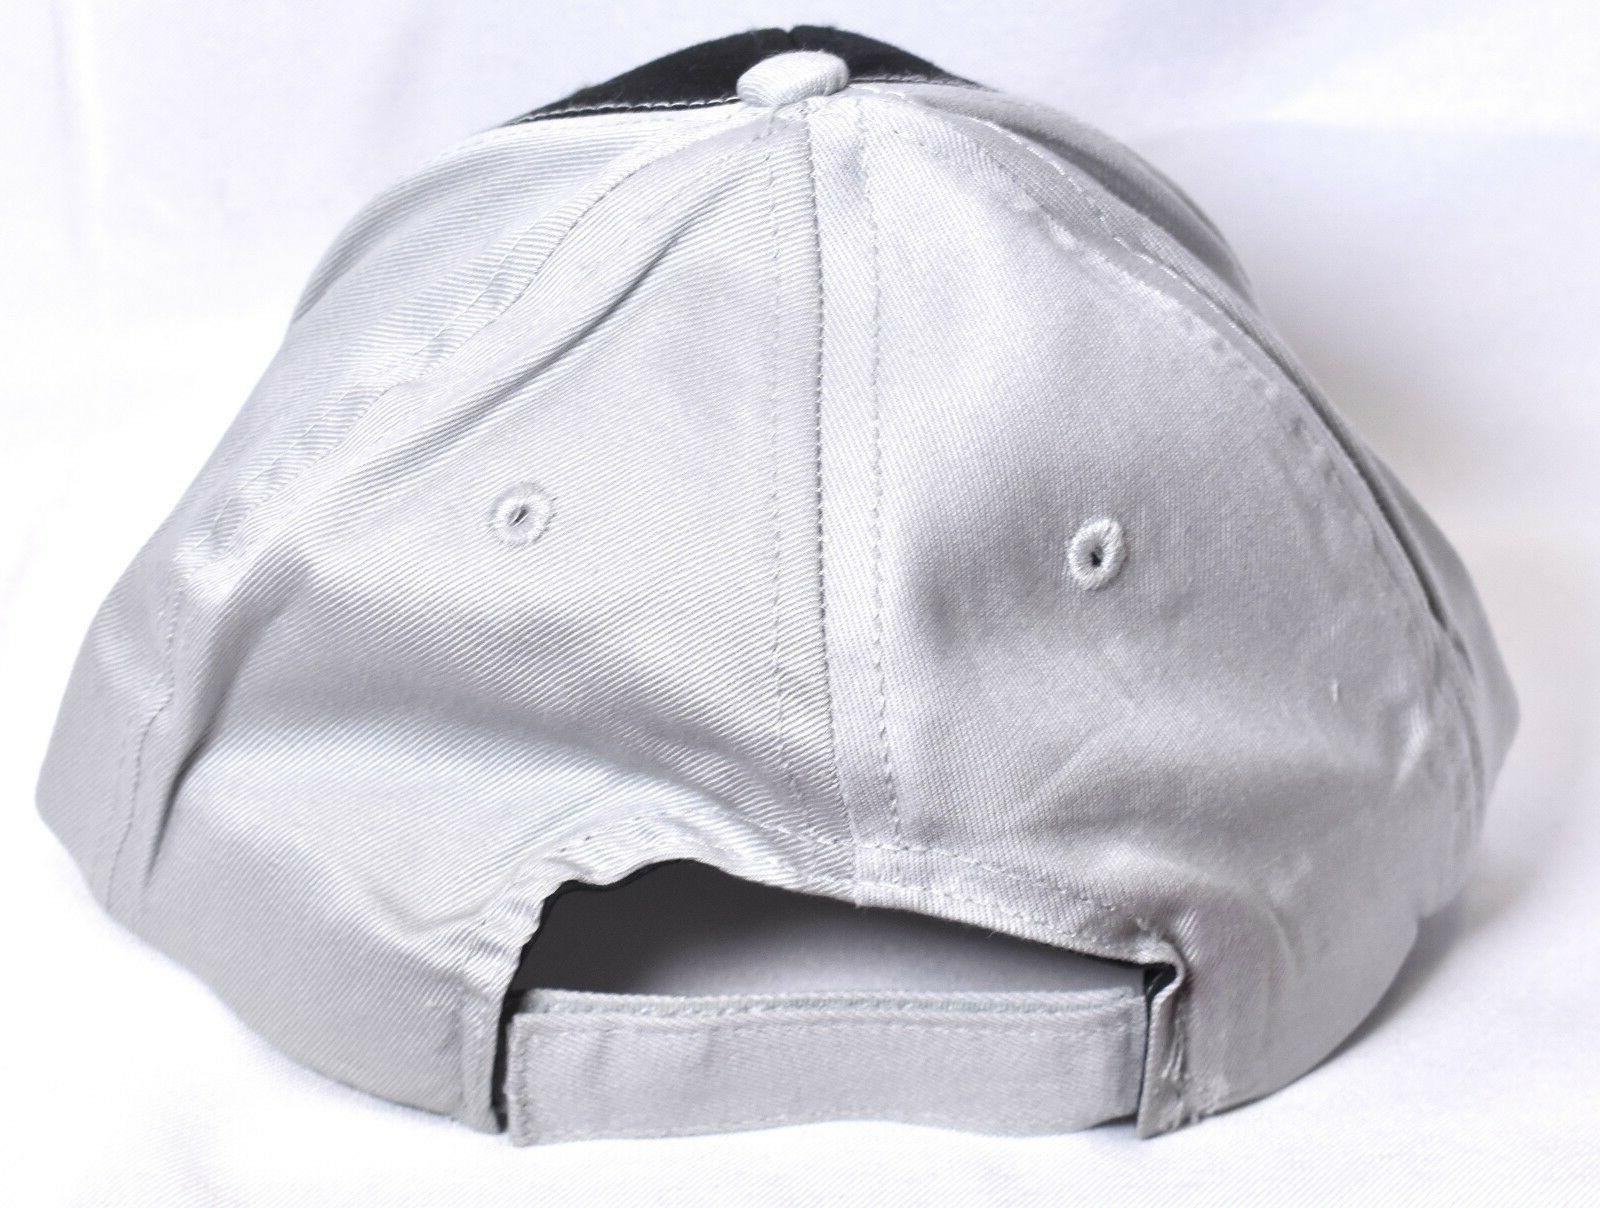 ADVANCE PROFESSIONAL Auto Parts Black & Gray Hat/Cap